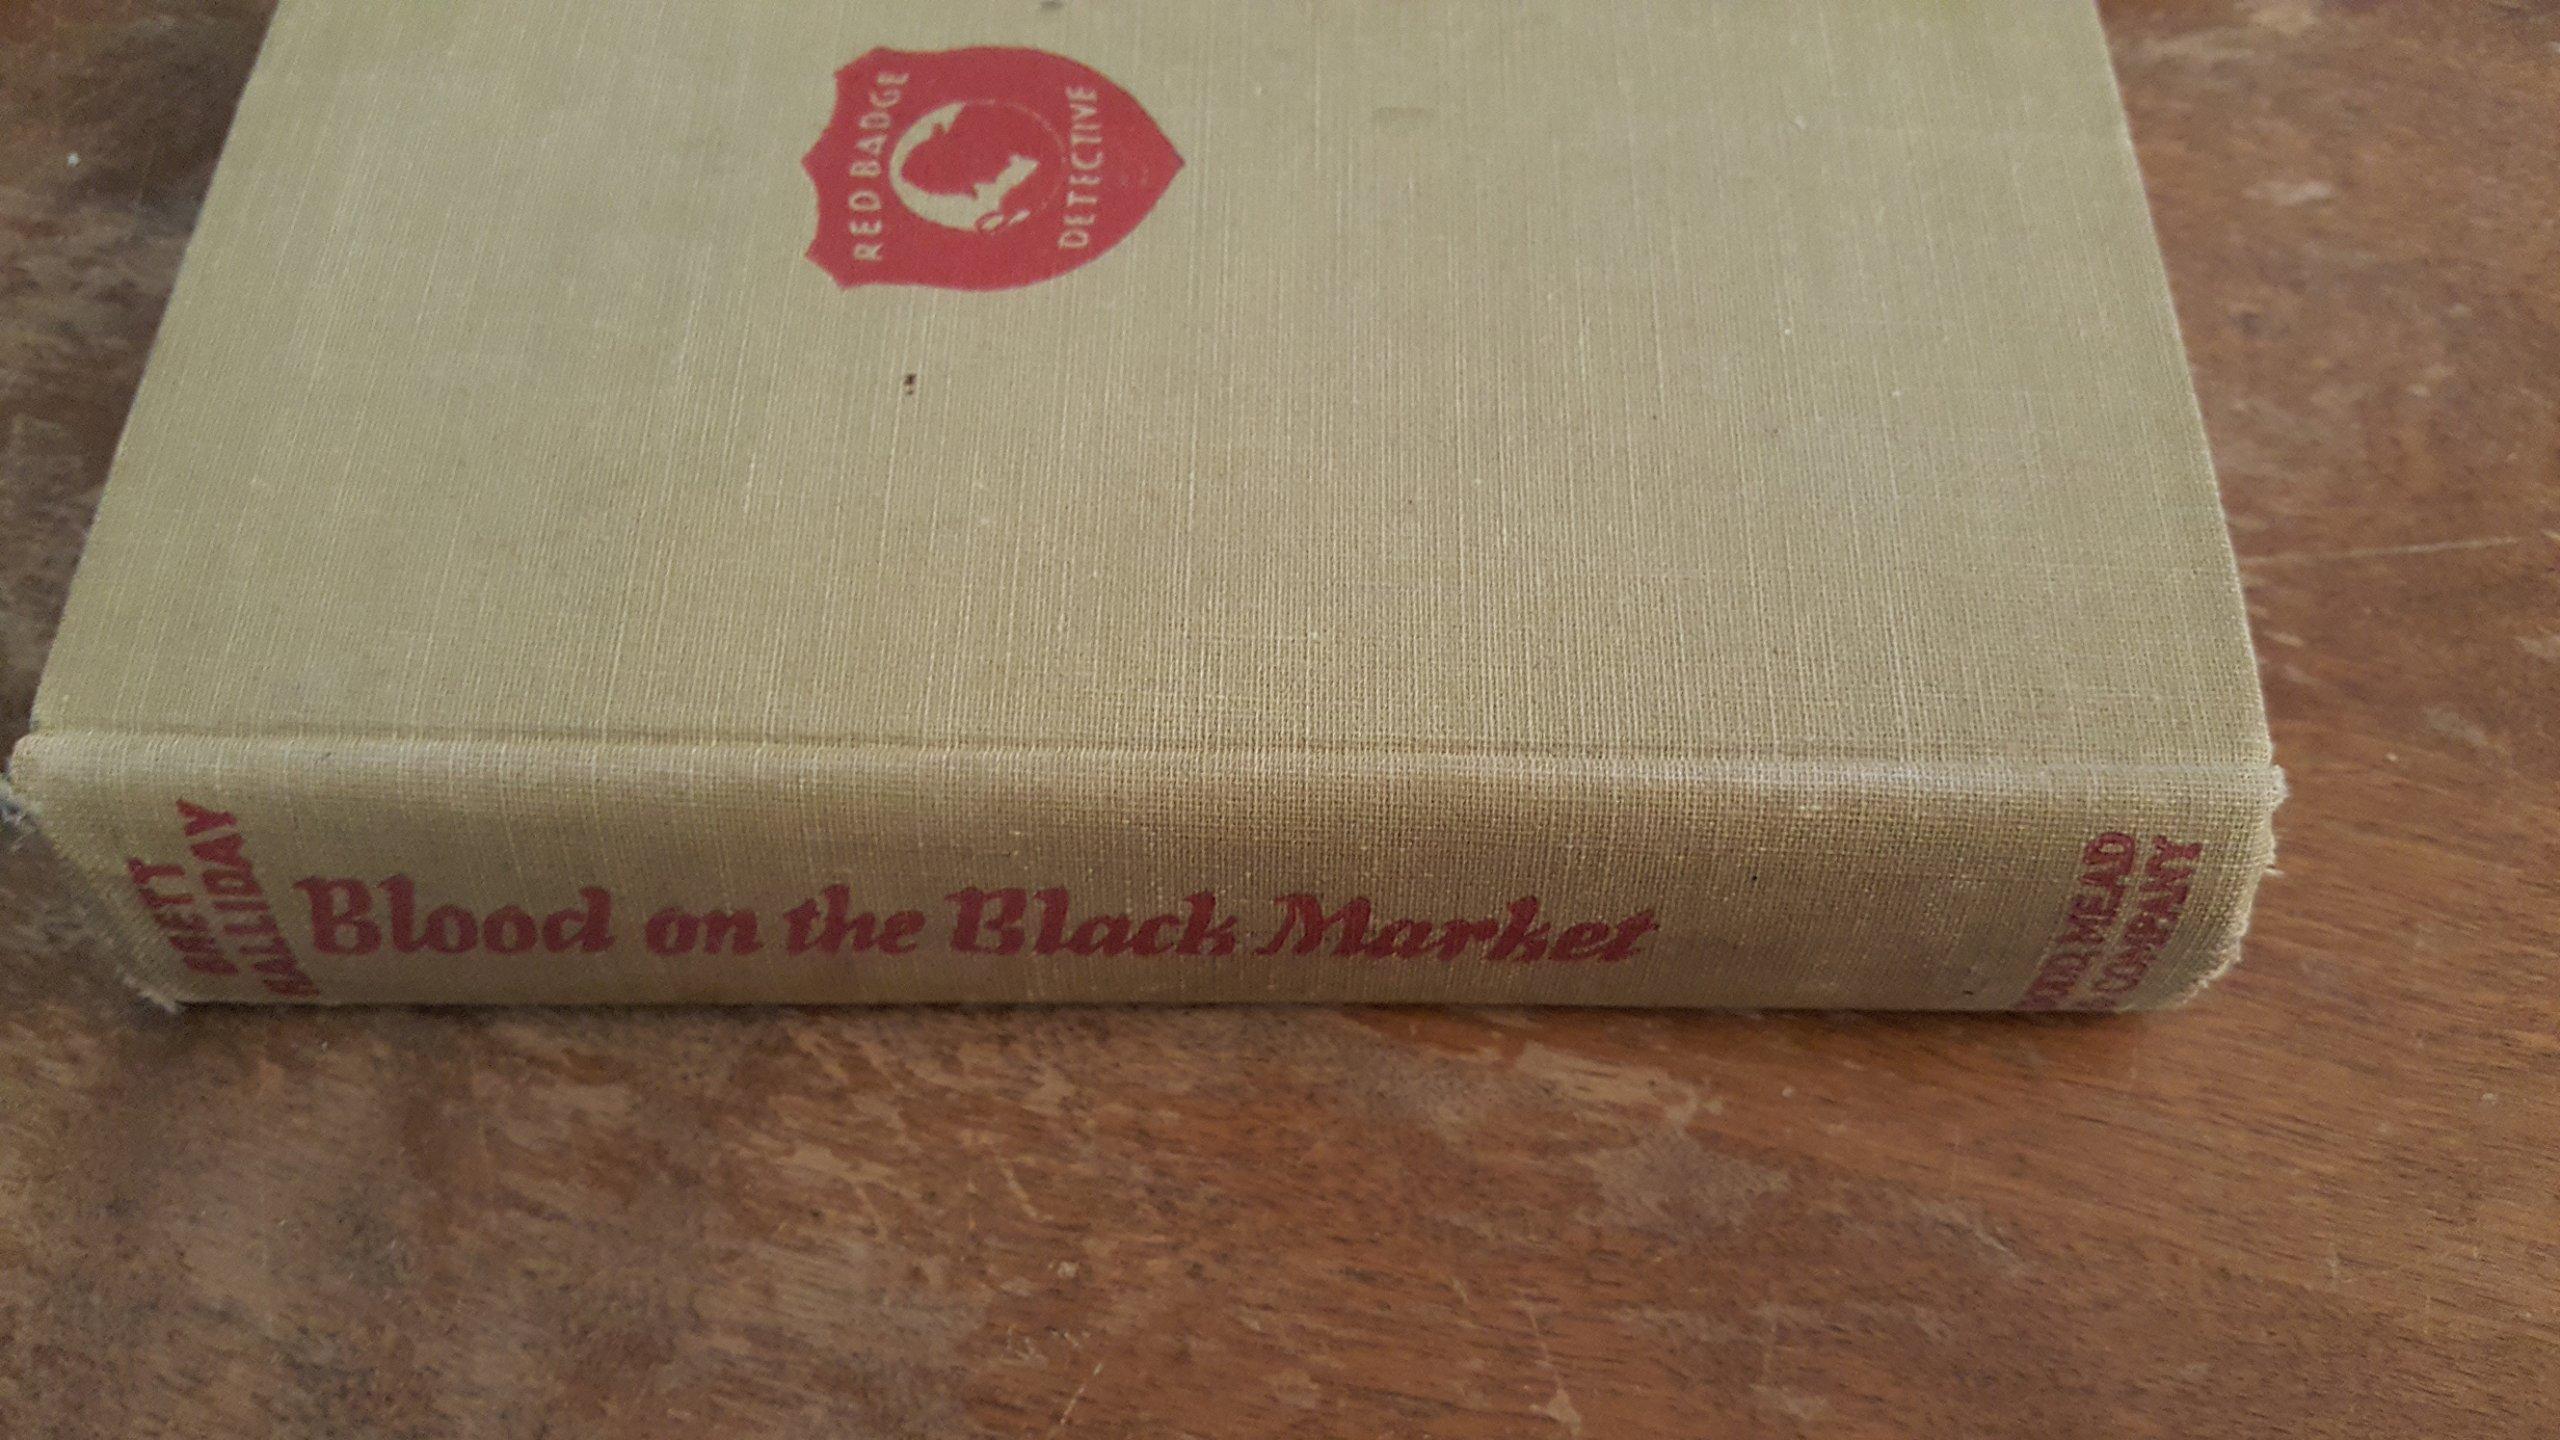 Blood on the black market a michael shayne mystery brett blood on the black market a michael shayne mystery brett halliday amazon books fandeluxe Document